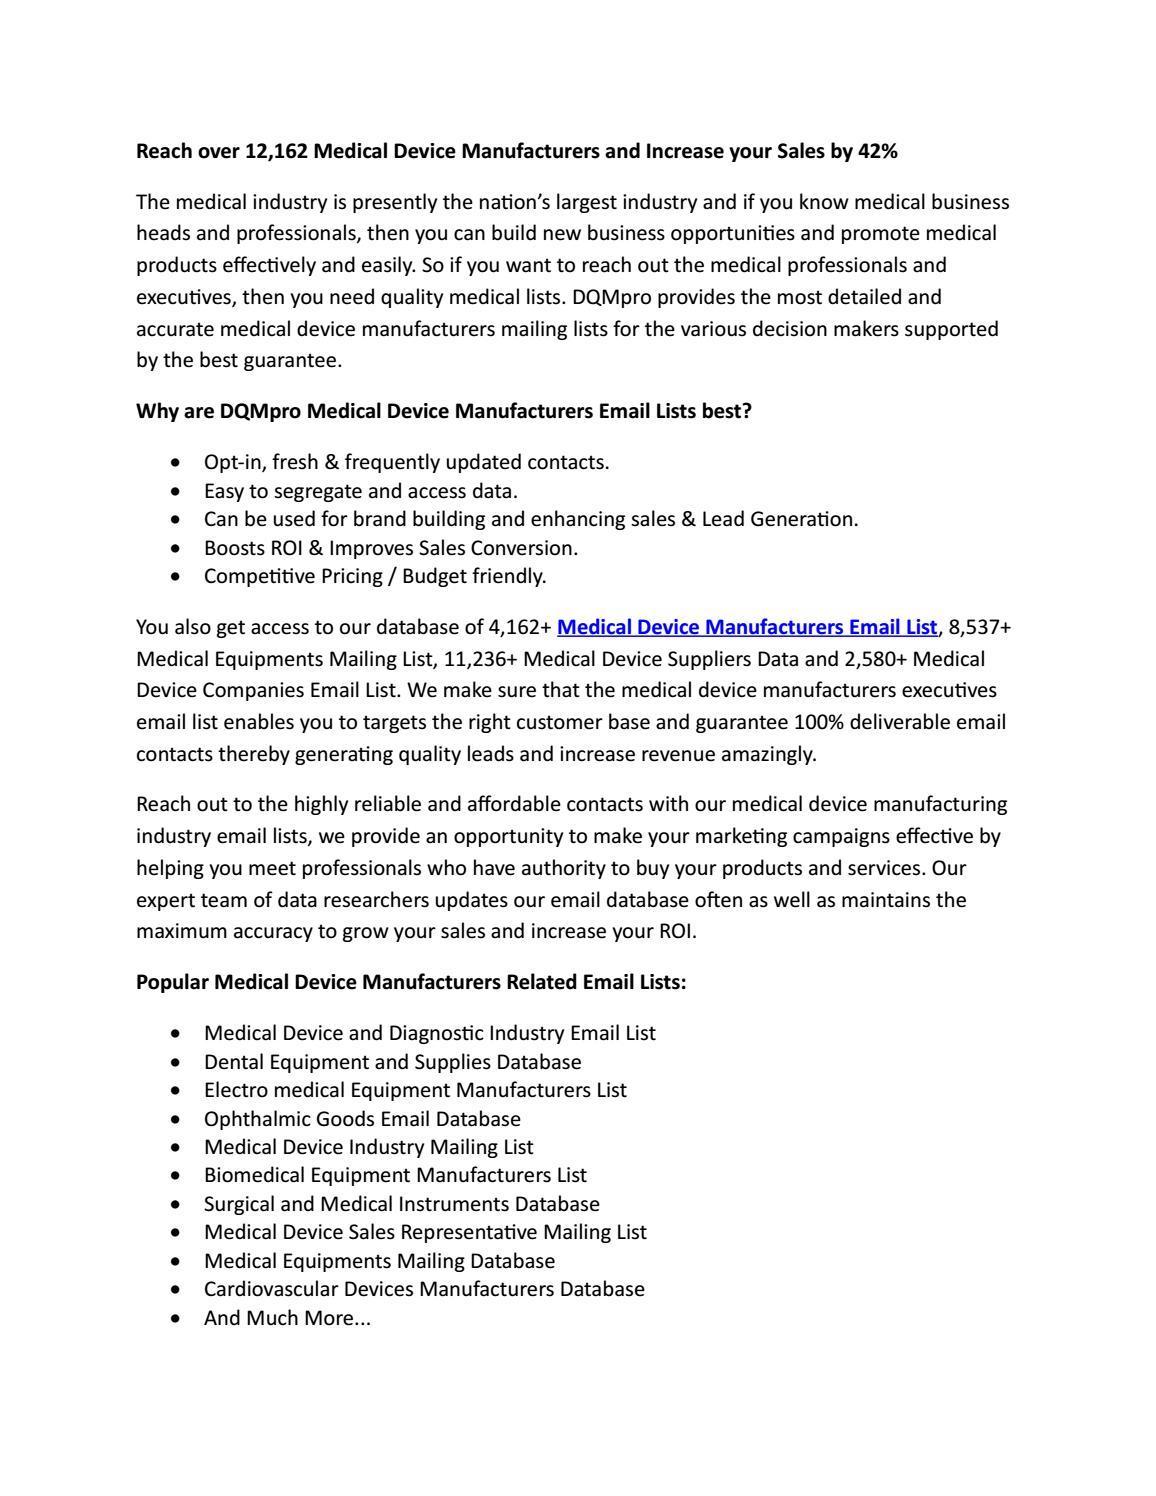 Manufacturing Companies Database